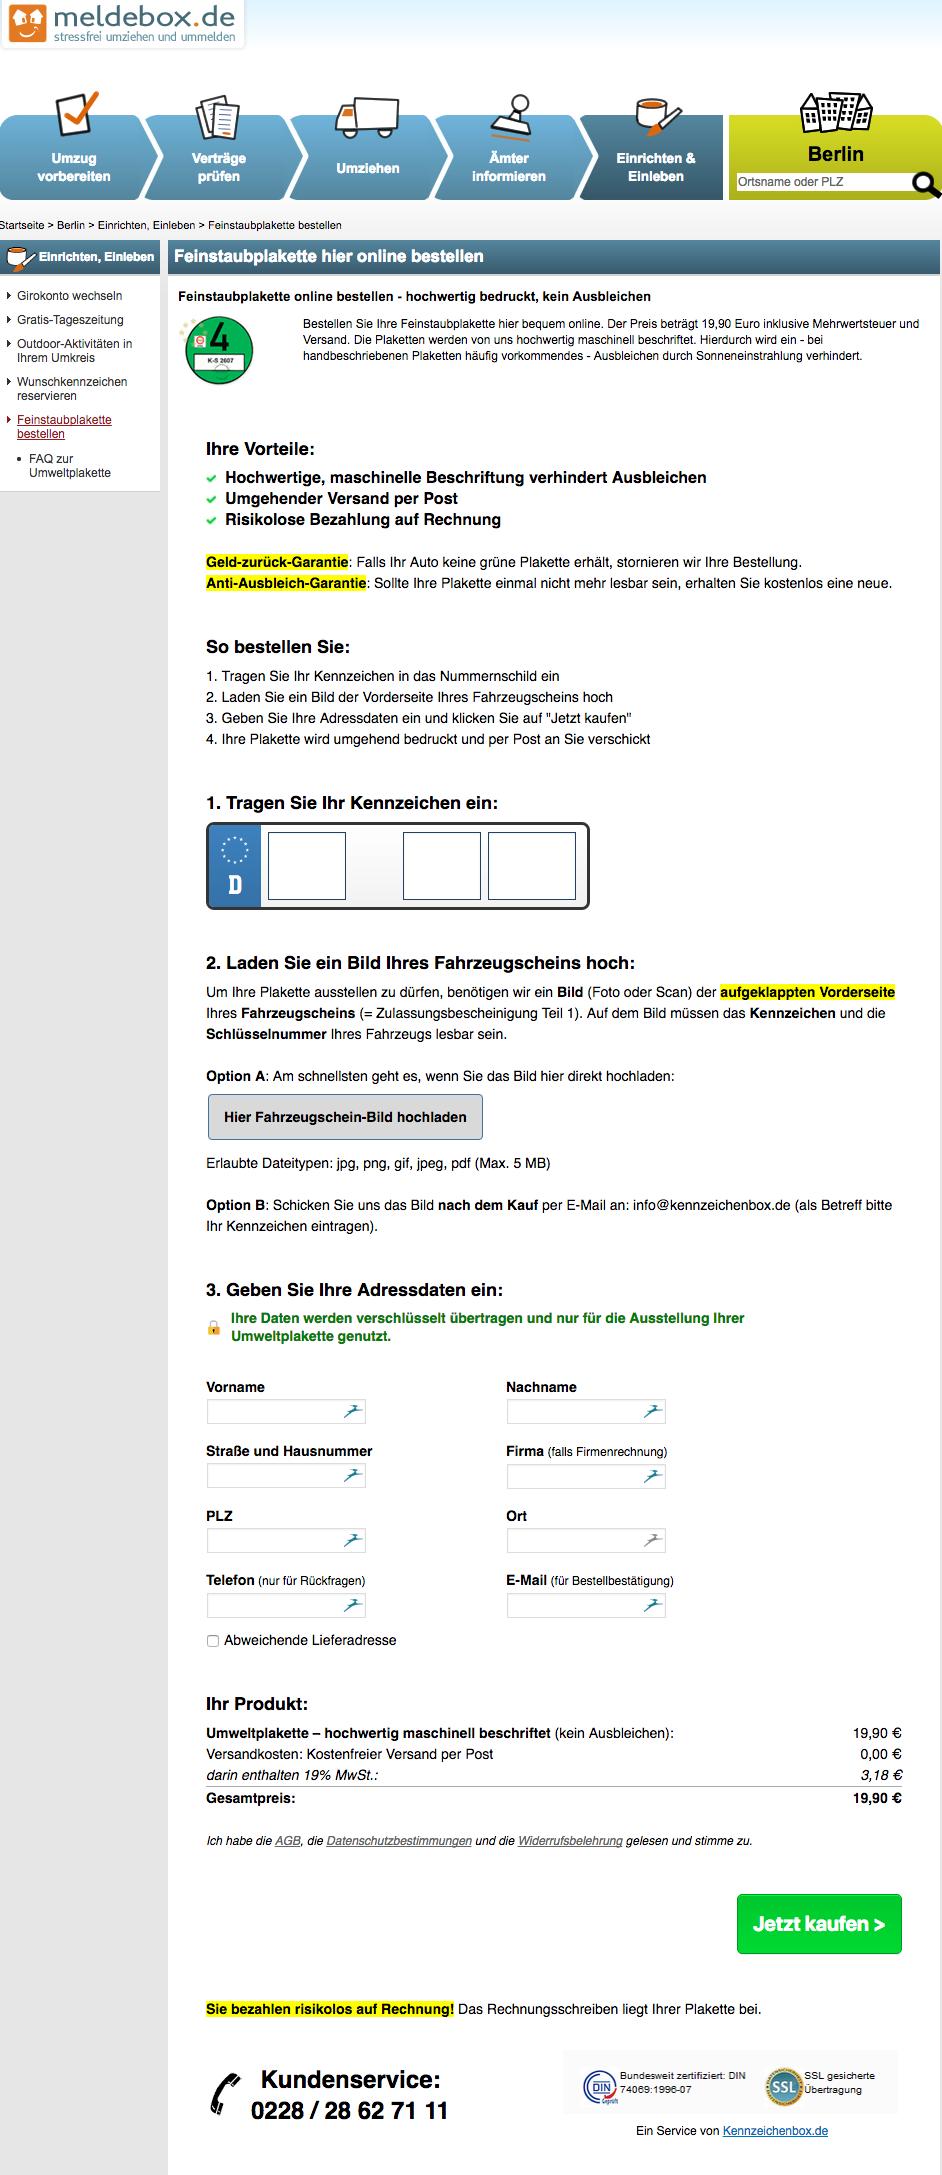 Beispiel WhiteLabel Umweltplakette Desktop: meldebox.de